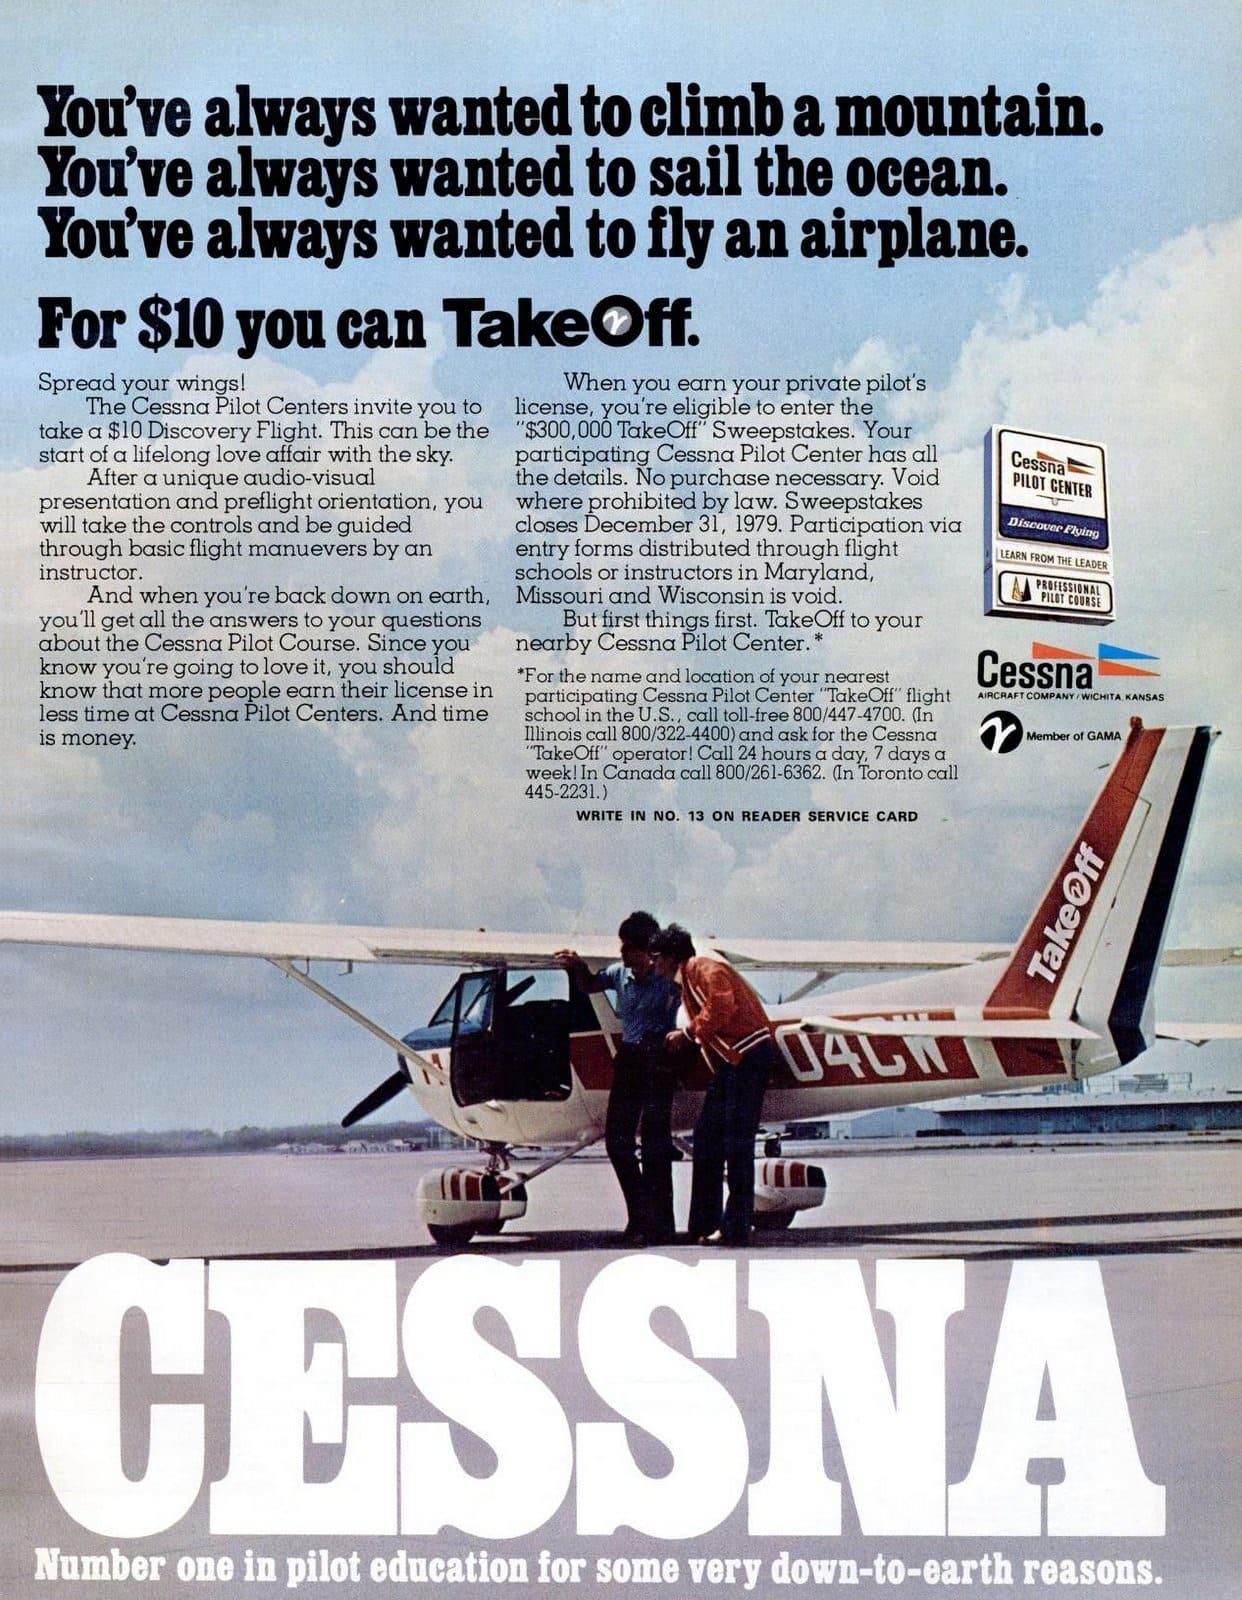 Cessna TakeOff flight school (1977)